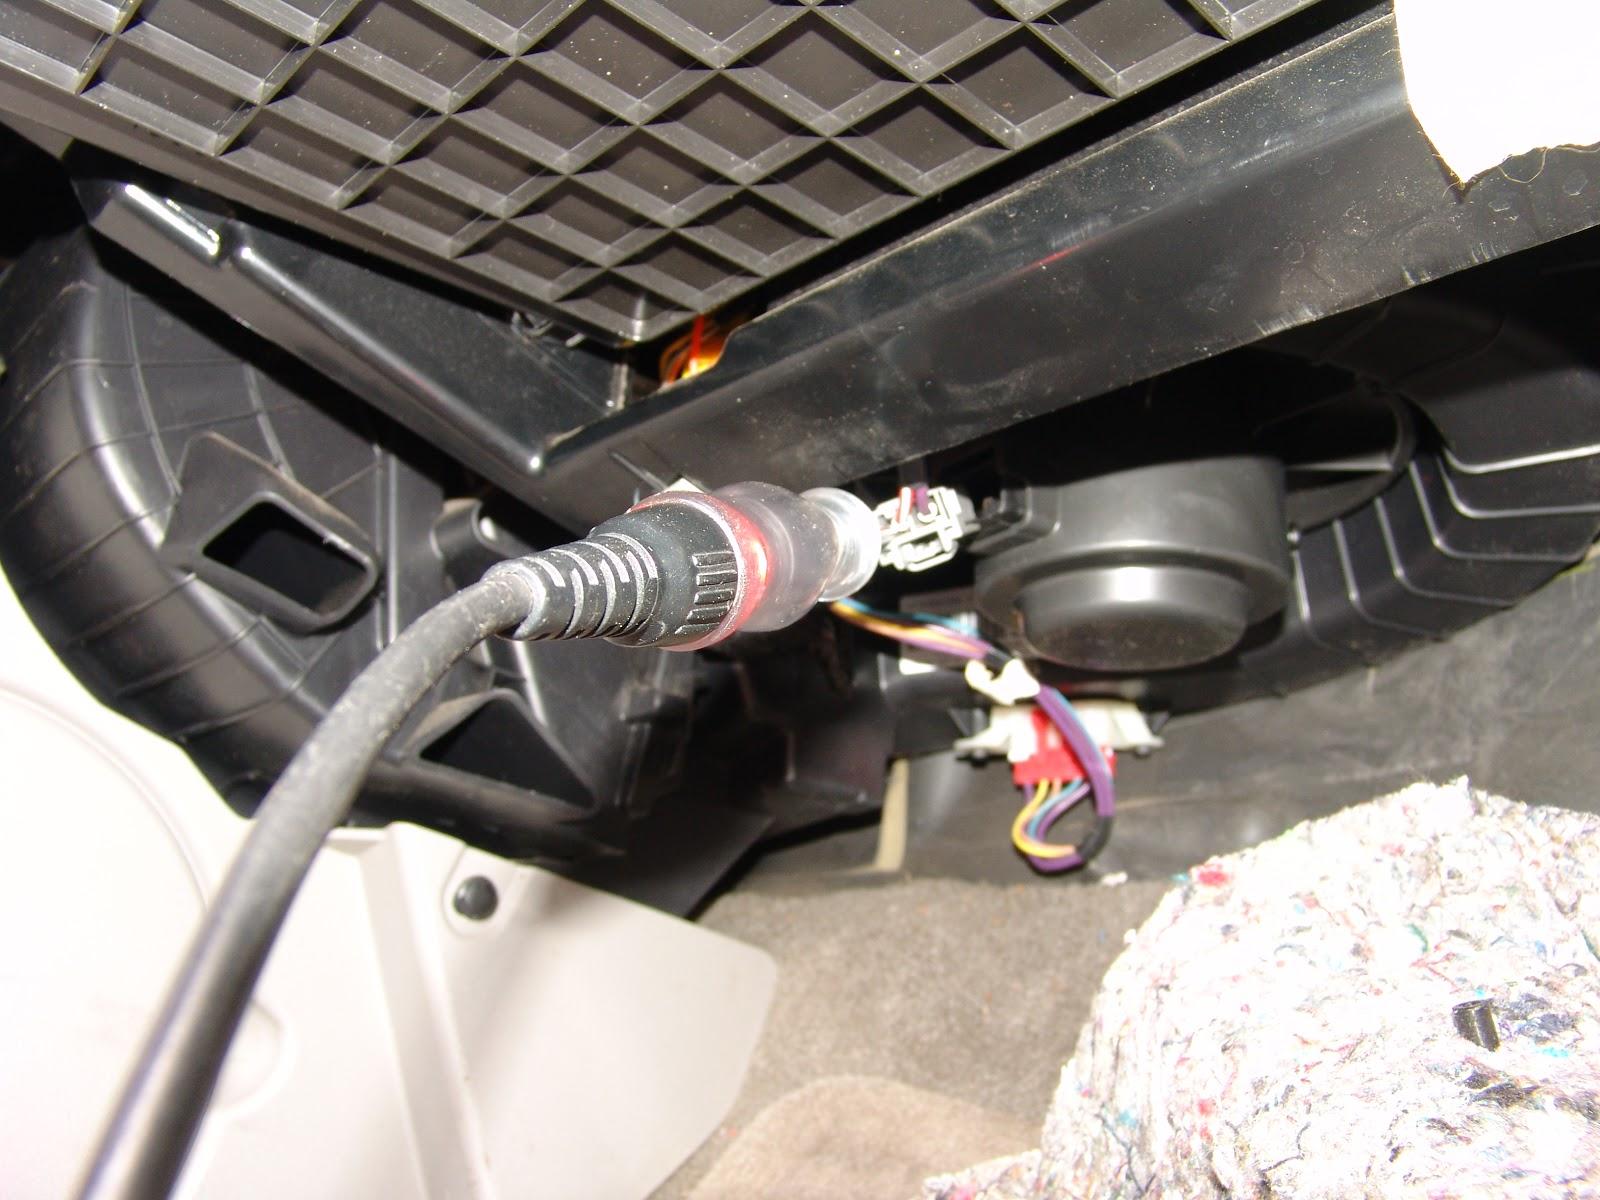 chevy cobalt cooling fan diagram chevy free engine image 2003 chevy trailblazer audio wiring diagram 2003 [ 1600 x 1200 Pixel ]